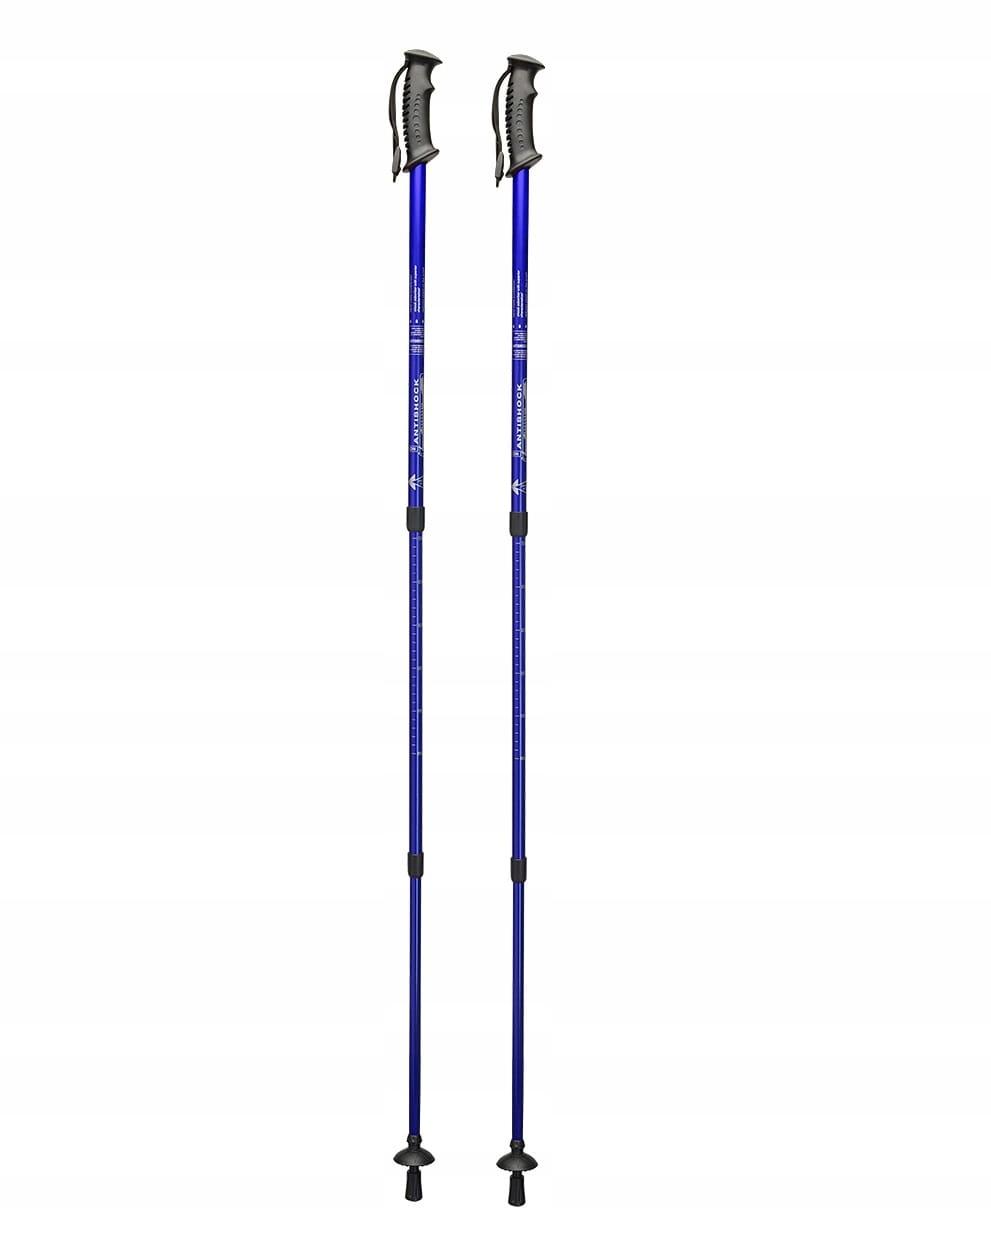 Палки палочки палки для NORDIC WALKING набор из 2 шт.